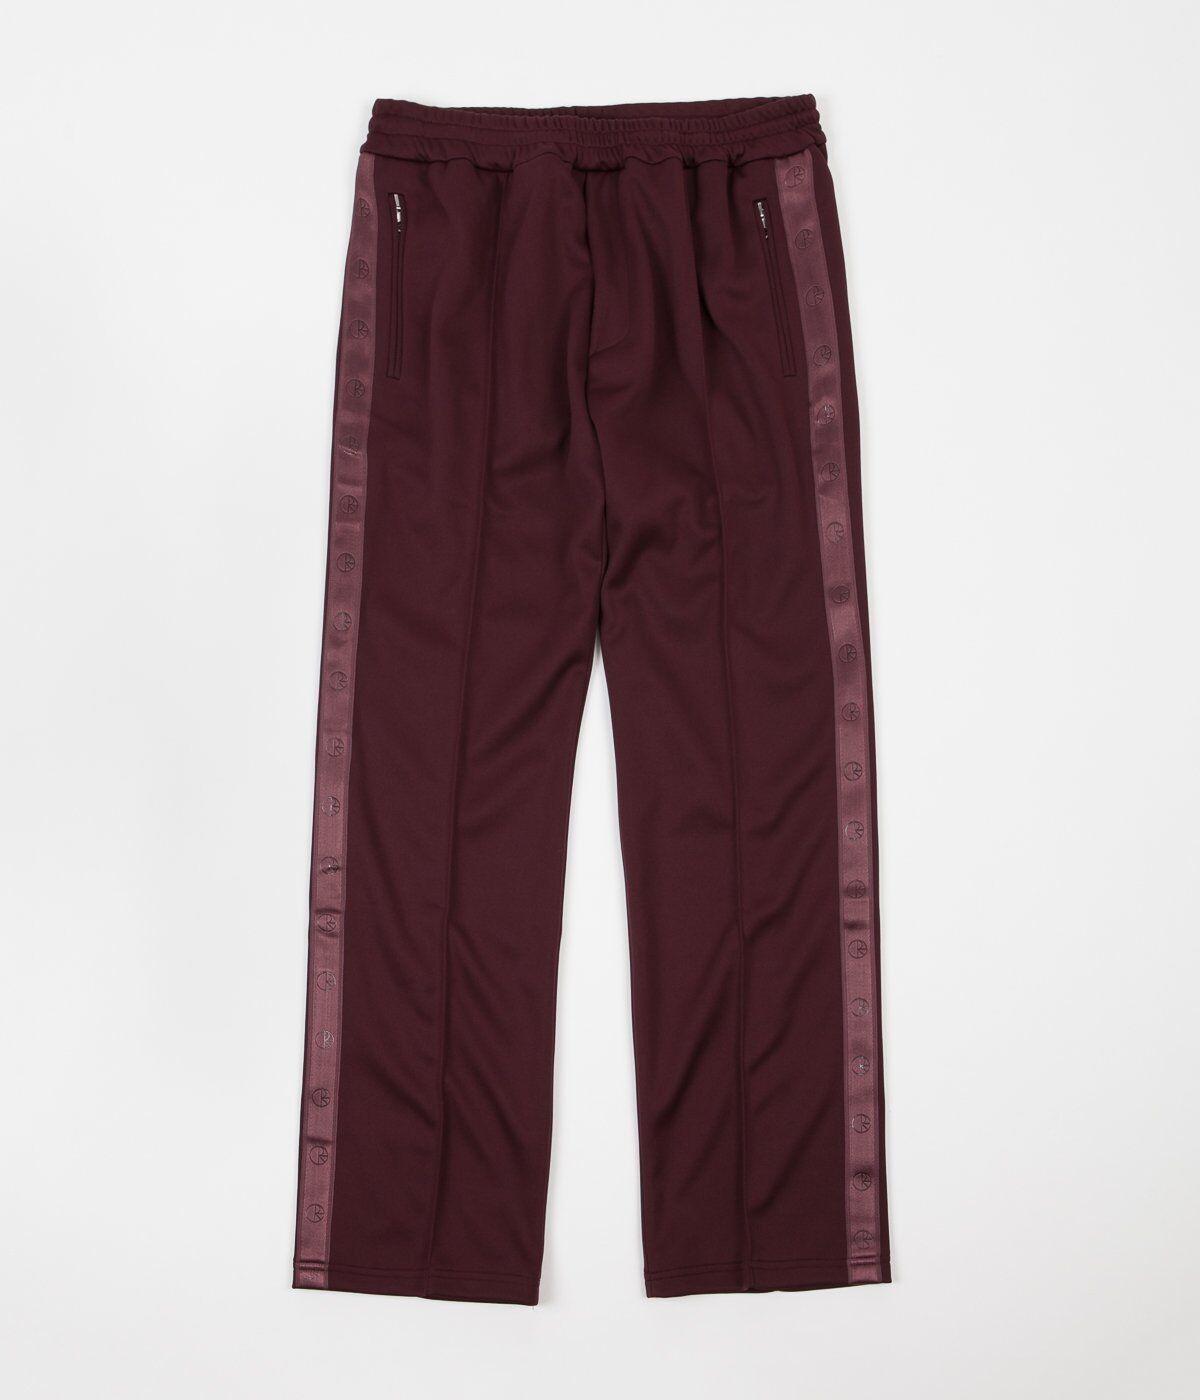 Polar X Très Bien Athlete Trousers, Wine, L